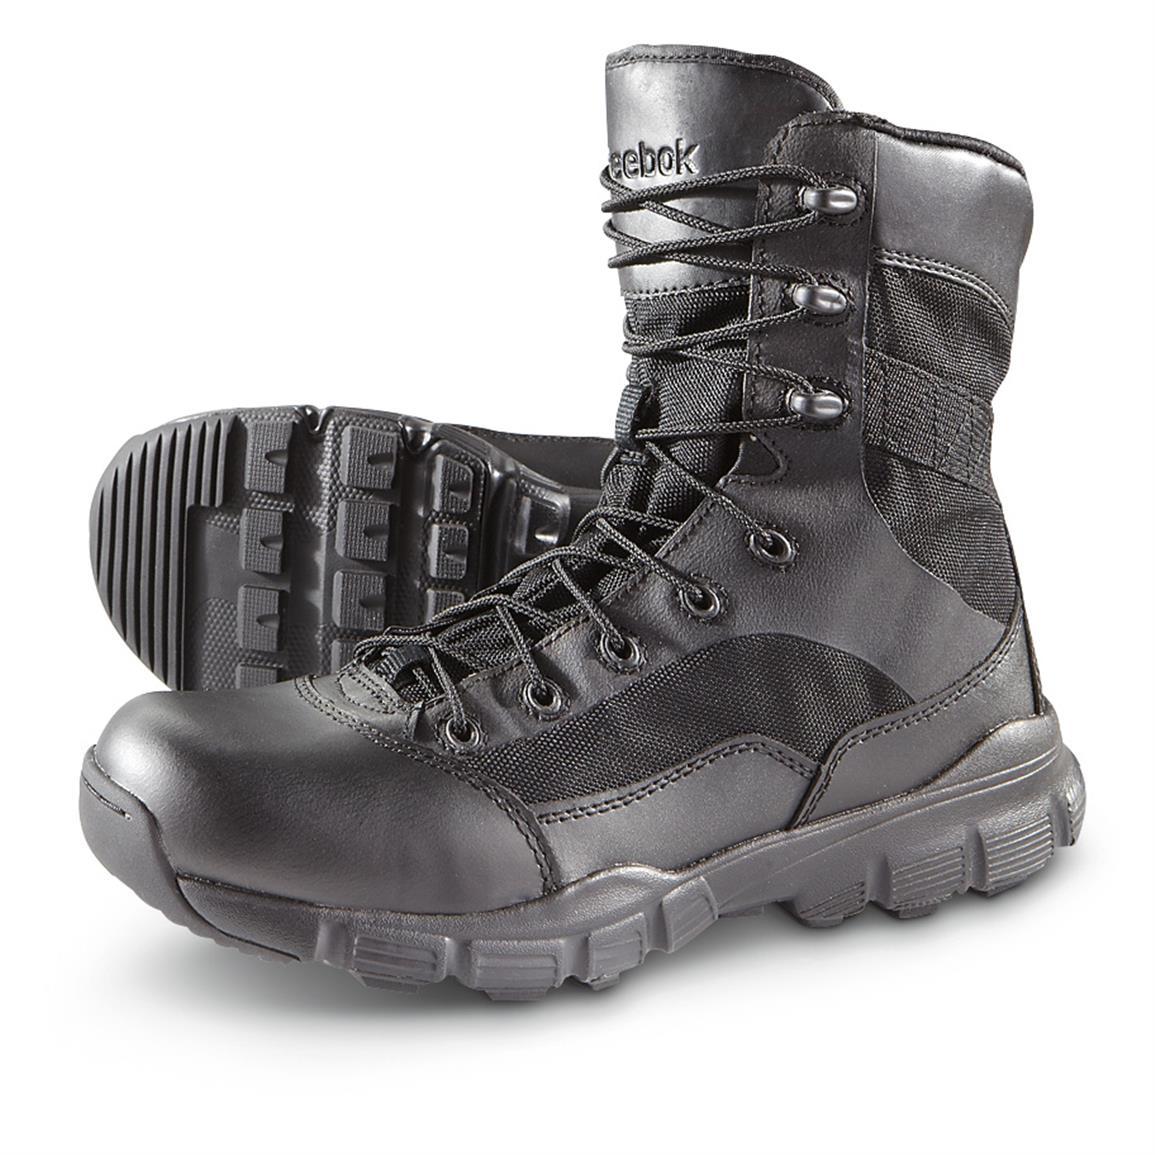 Under Armor Footwear